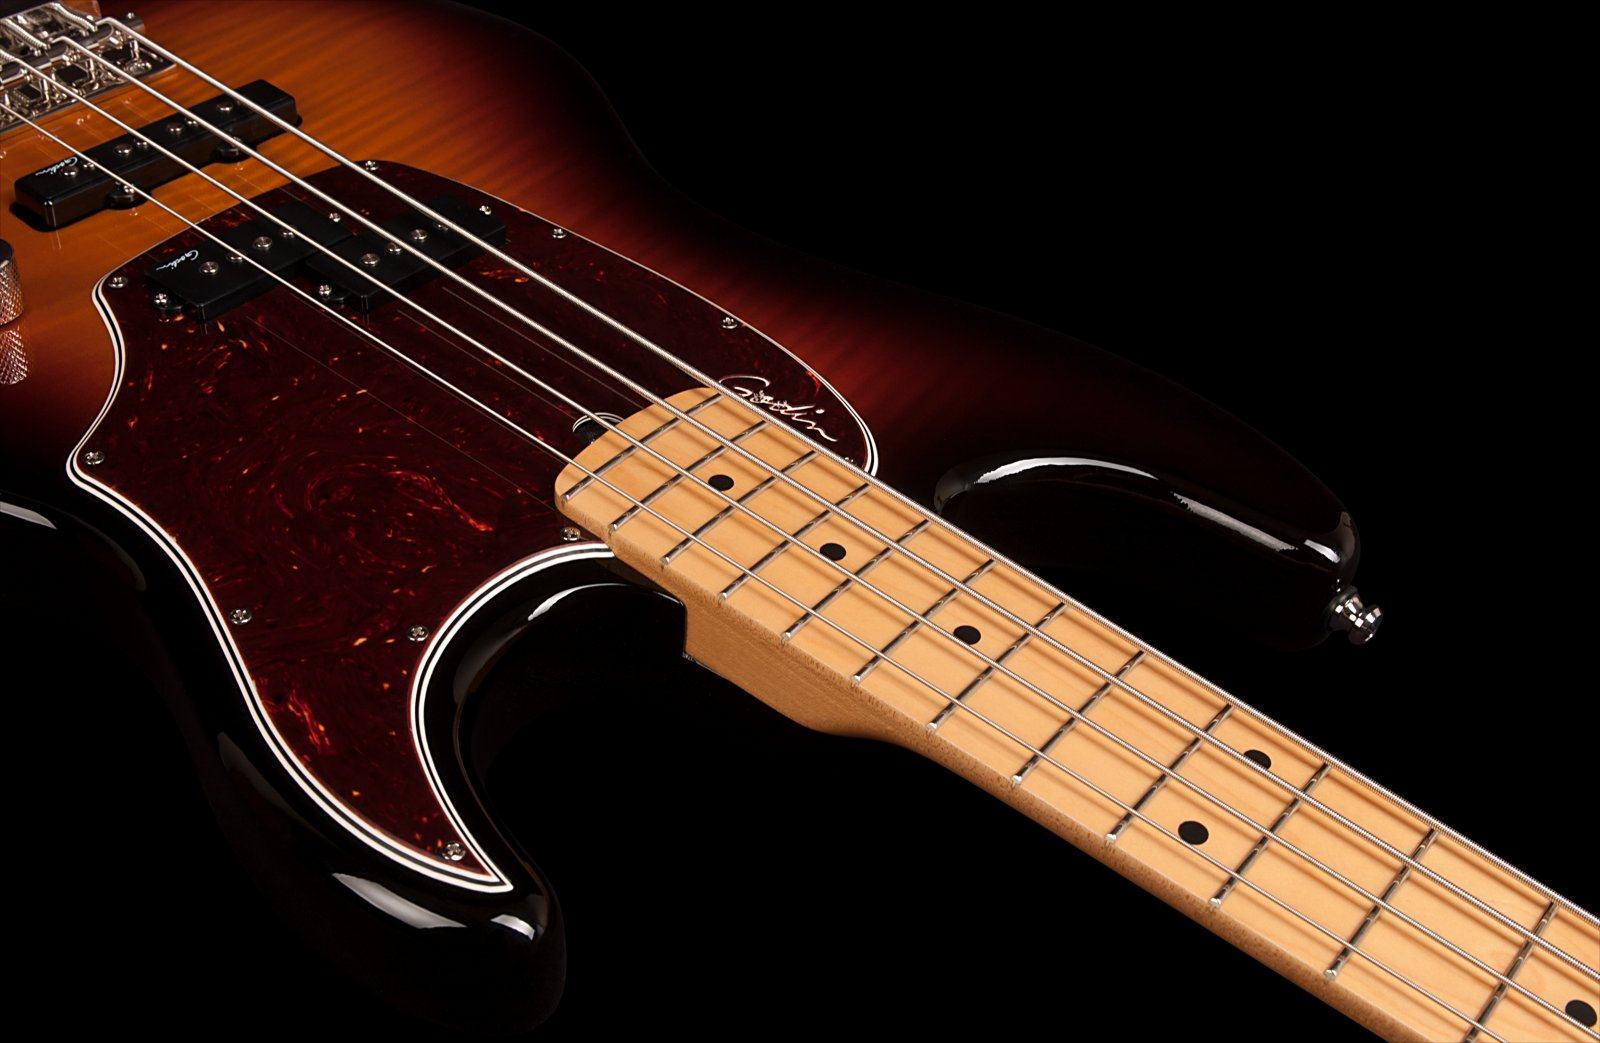 Godin 046928 Shifter Classic 4 String Bass Guitar - Vintage Burst HG MN  w/Bag - Acclaim Sound and Lighting Canada